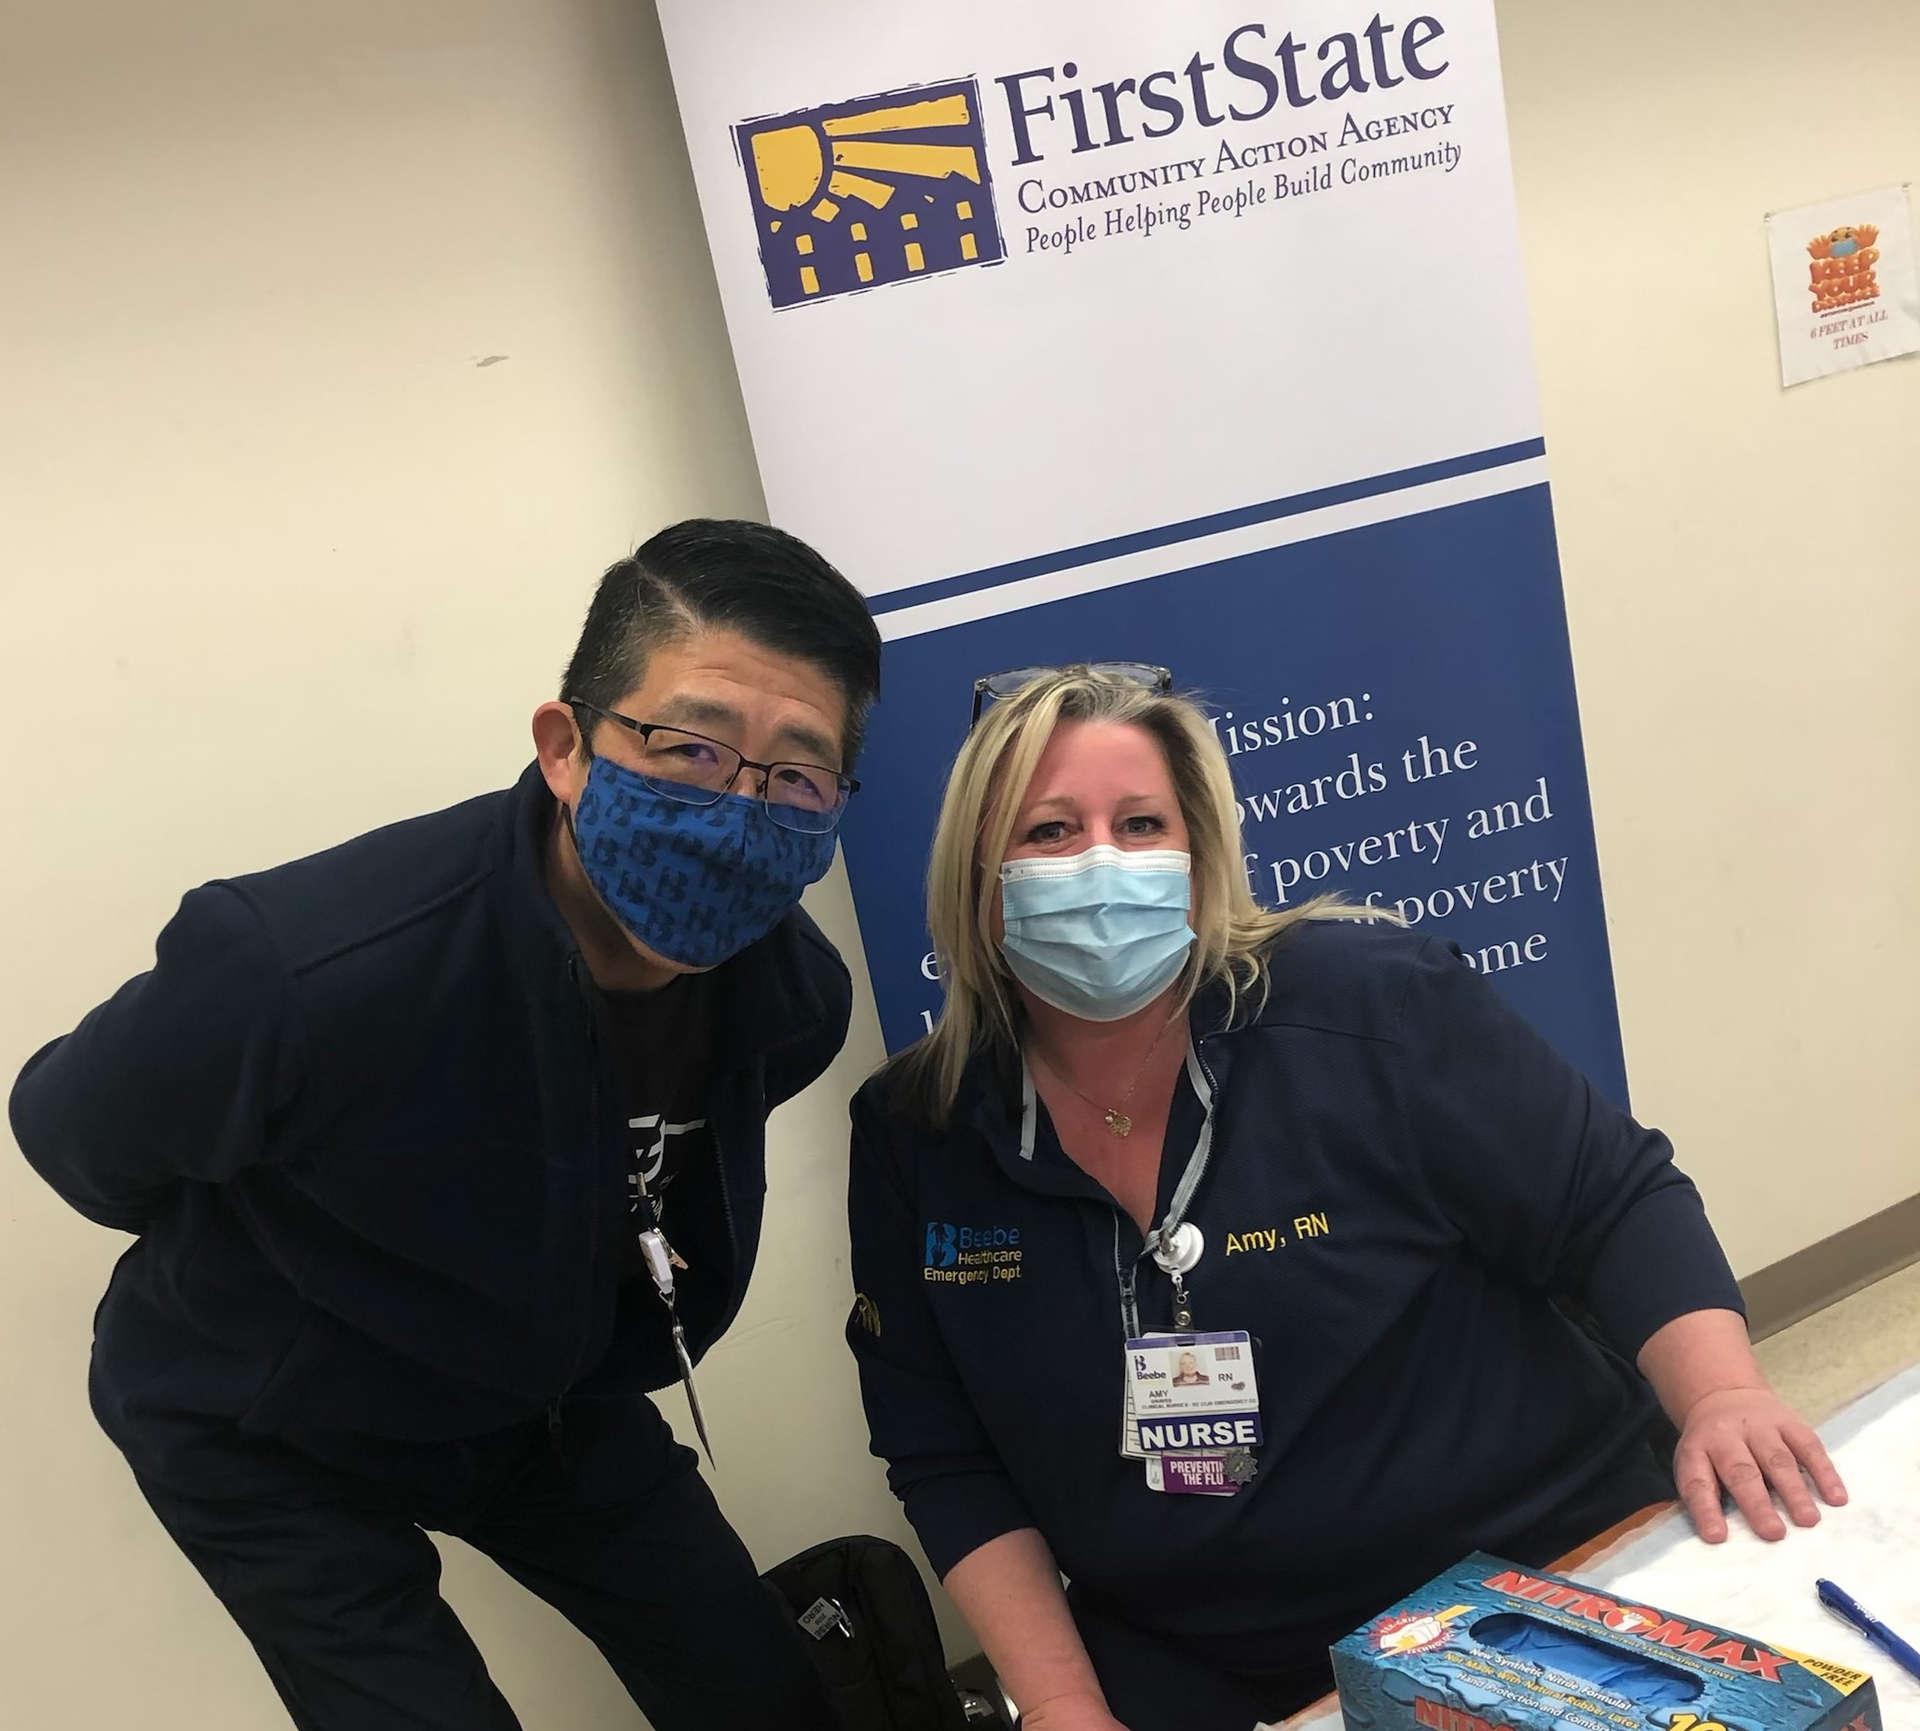 Dr. Tam & Nurse Amy